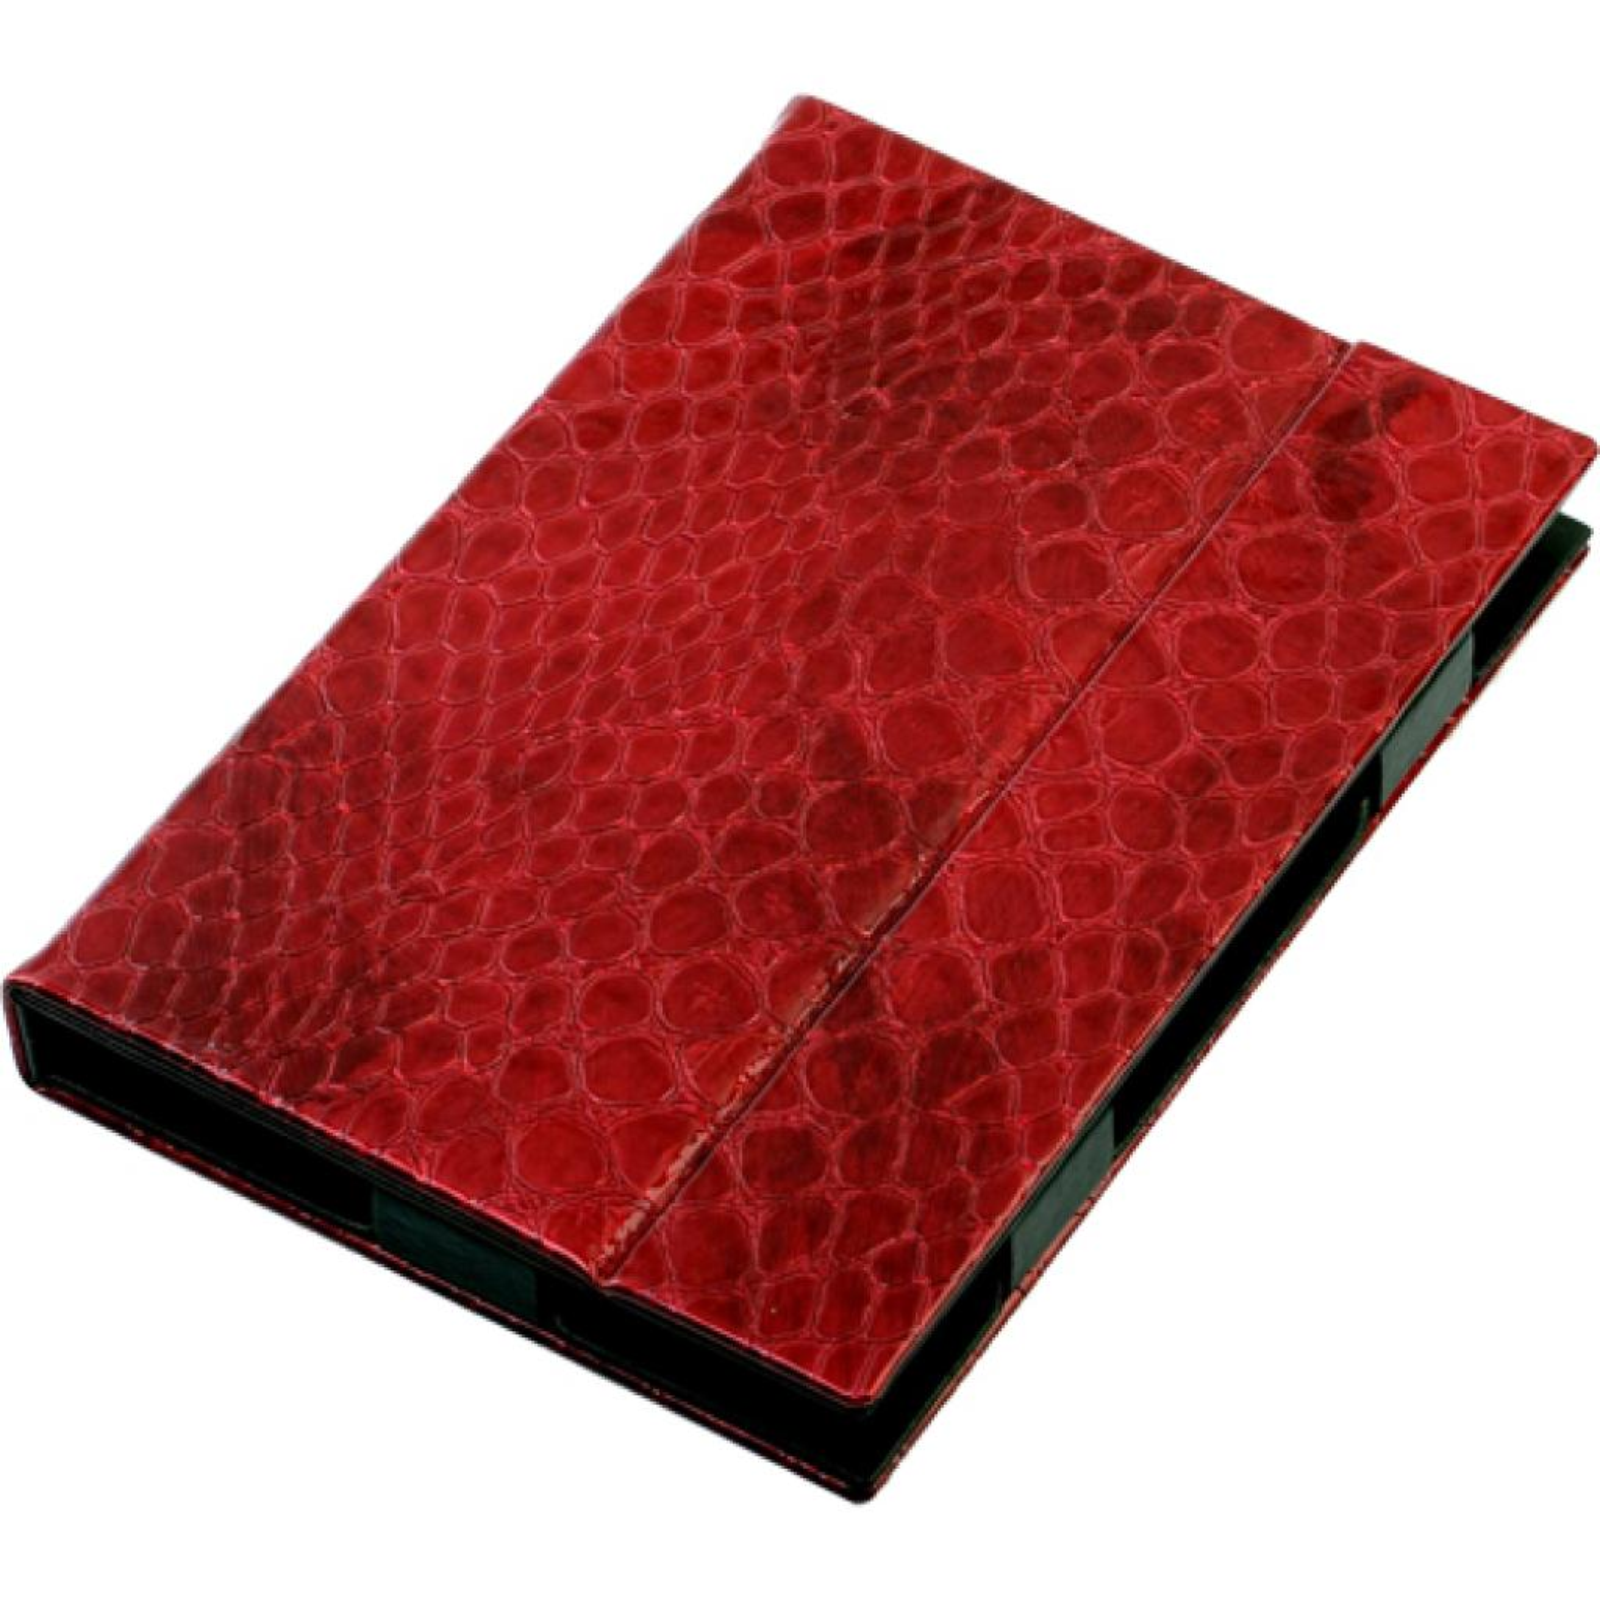 Чехол для планшета Vento 9.7 Desire glossy - red reptile